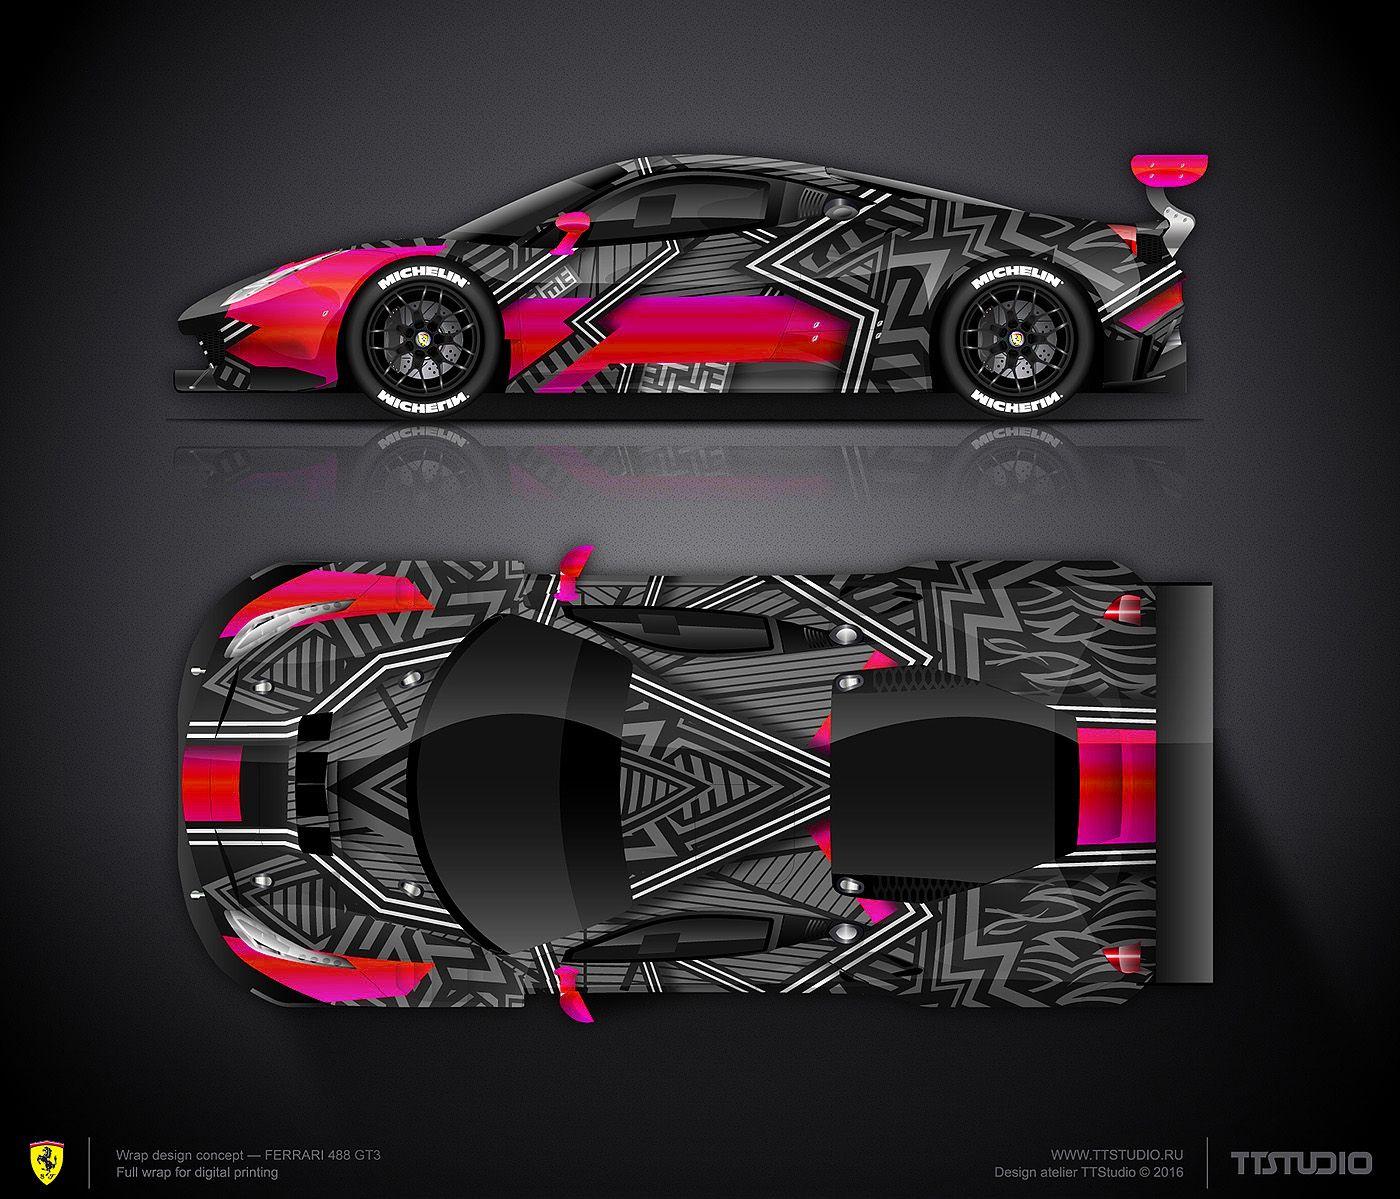 Car body sticker design for sale - Wrap Design Concept Art Car For Ferrari F488 Gt3 For Sale